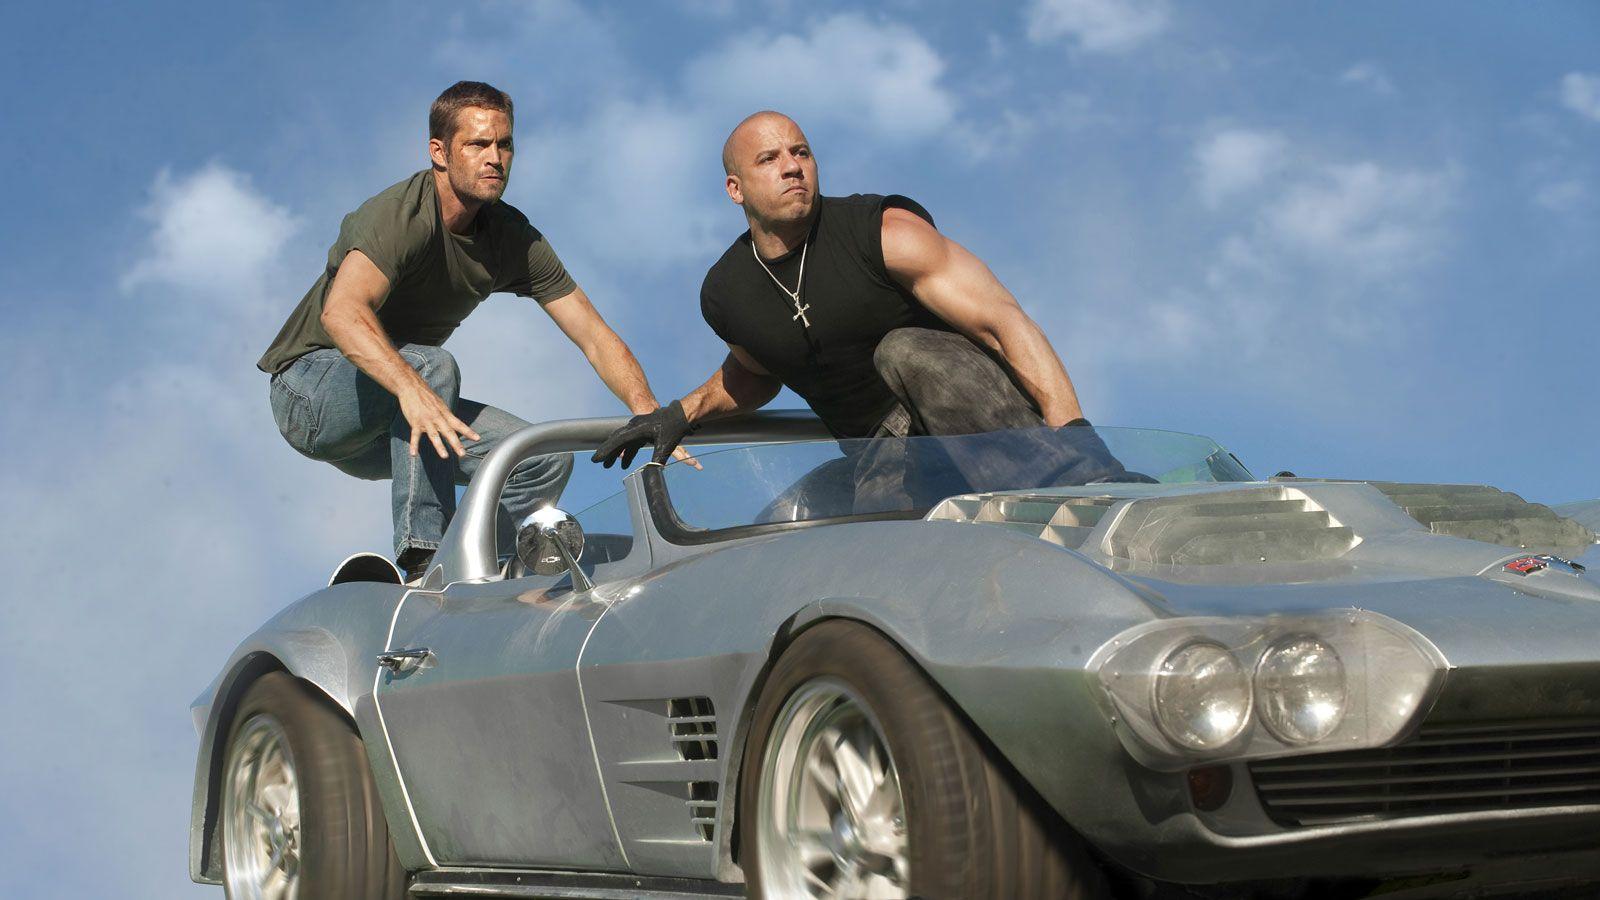 Fast Furious Movie Cash Assault on Precinct 13 Details